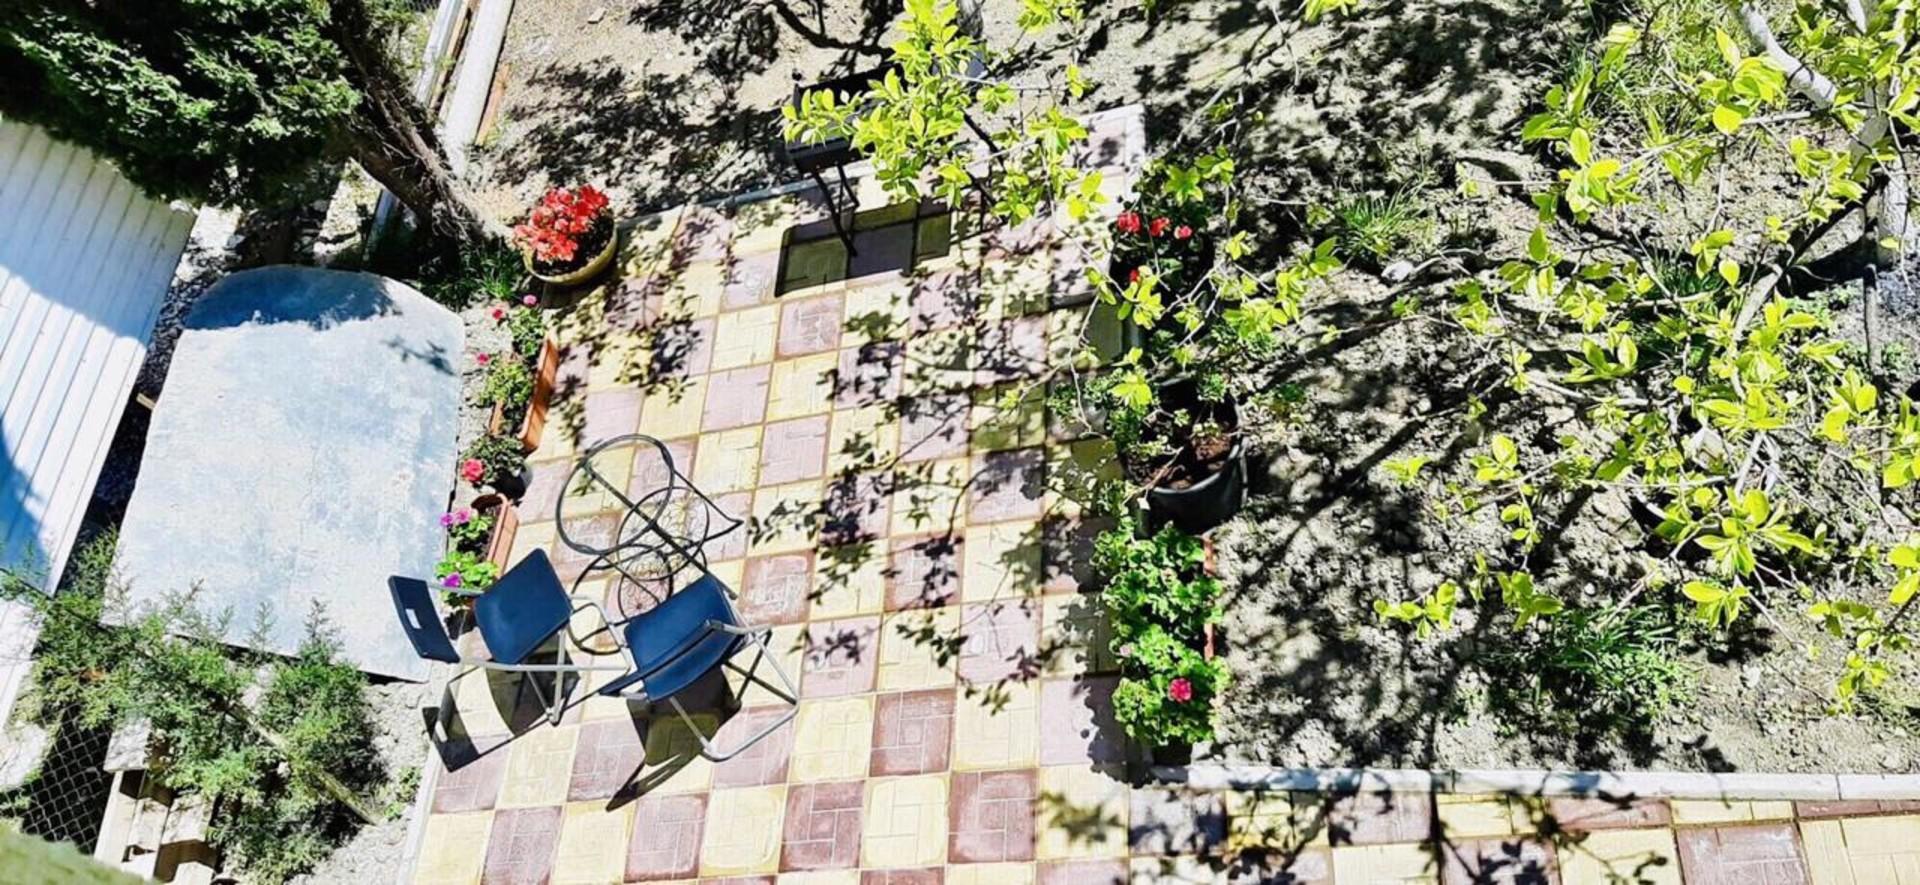 image-06-08-19-01-04-1.jpeg